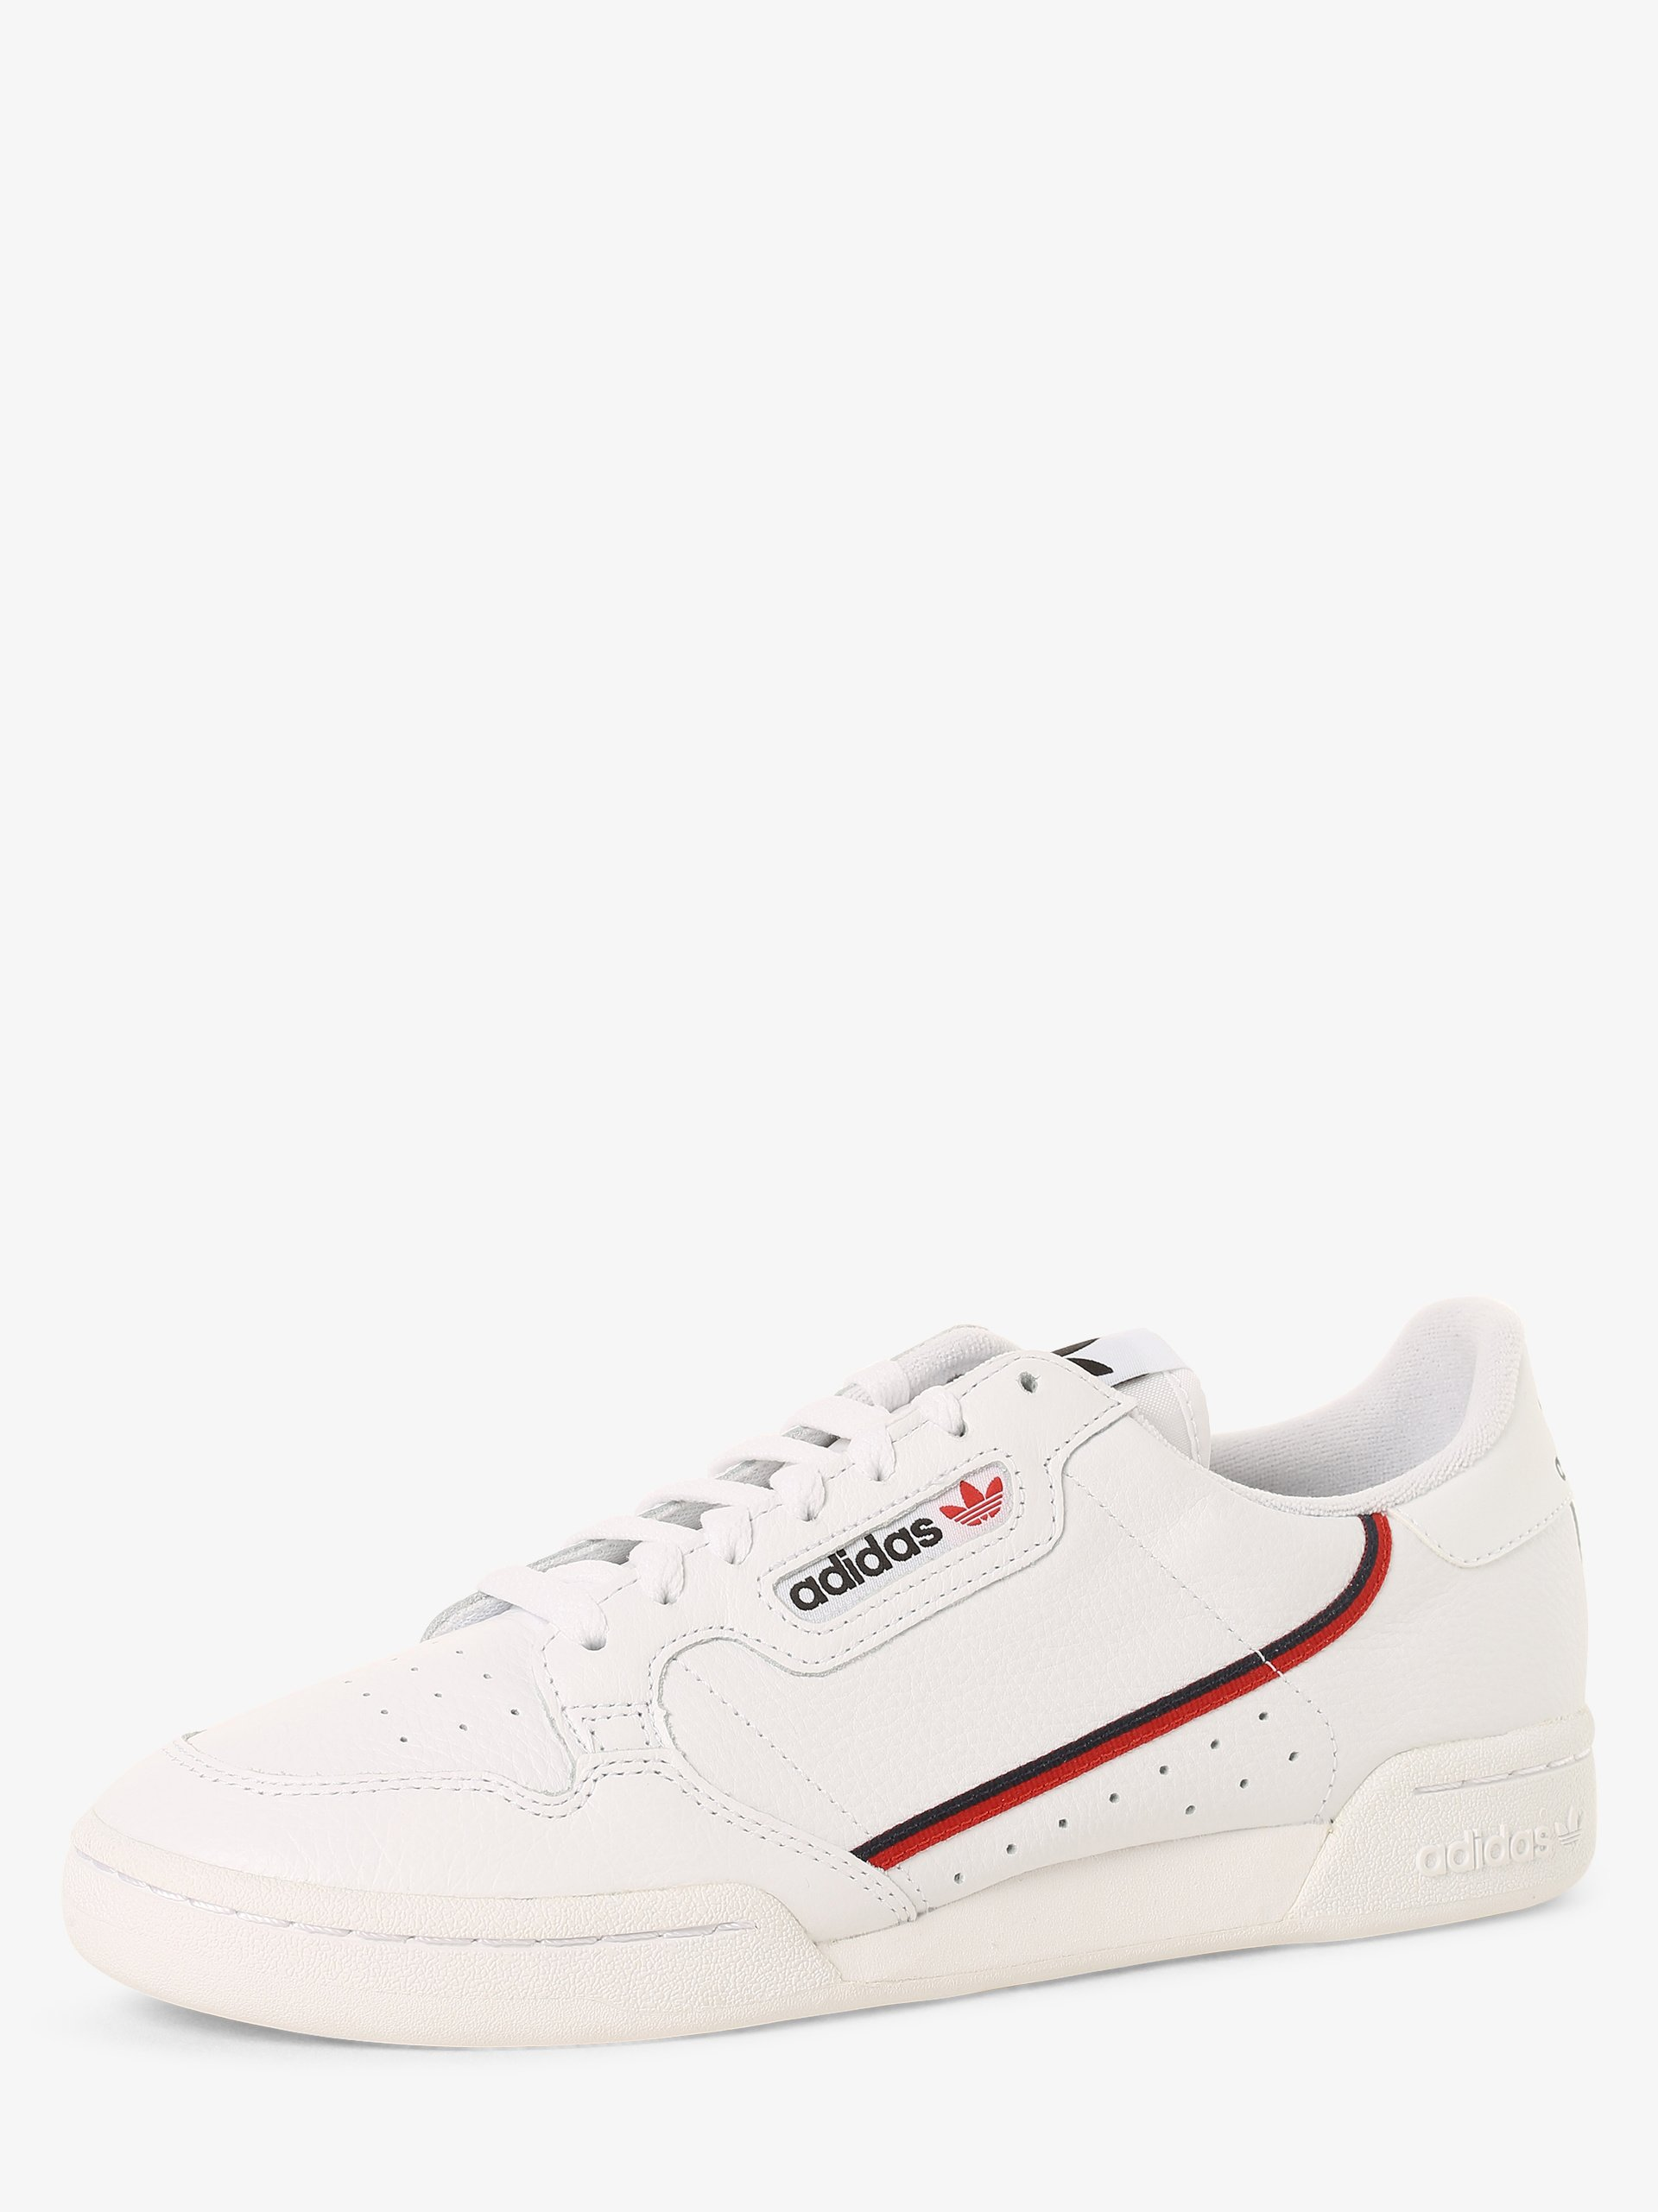 adidas Originals Herren Sneaker aus Leder - Continental 80